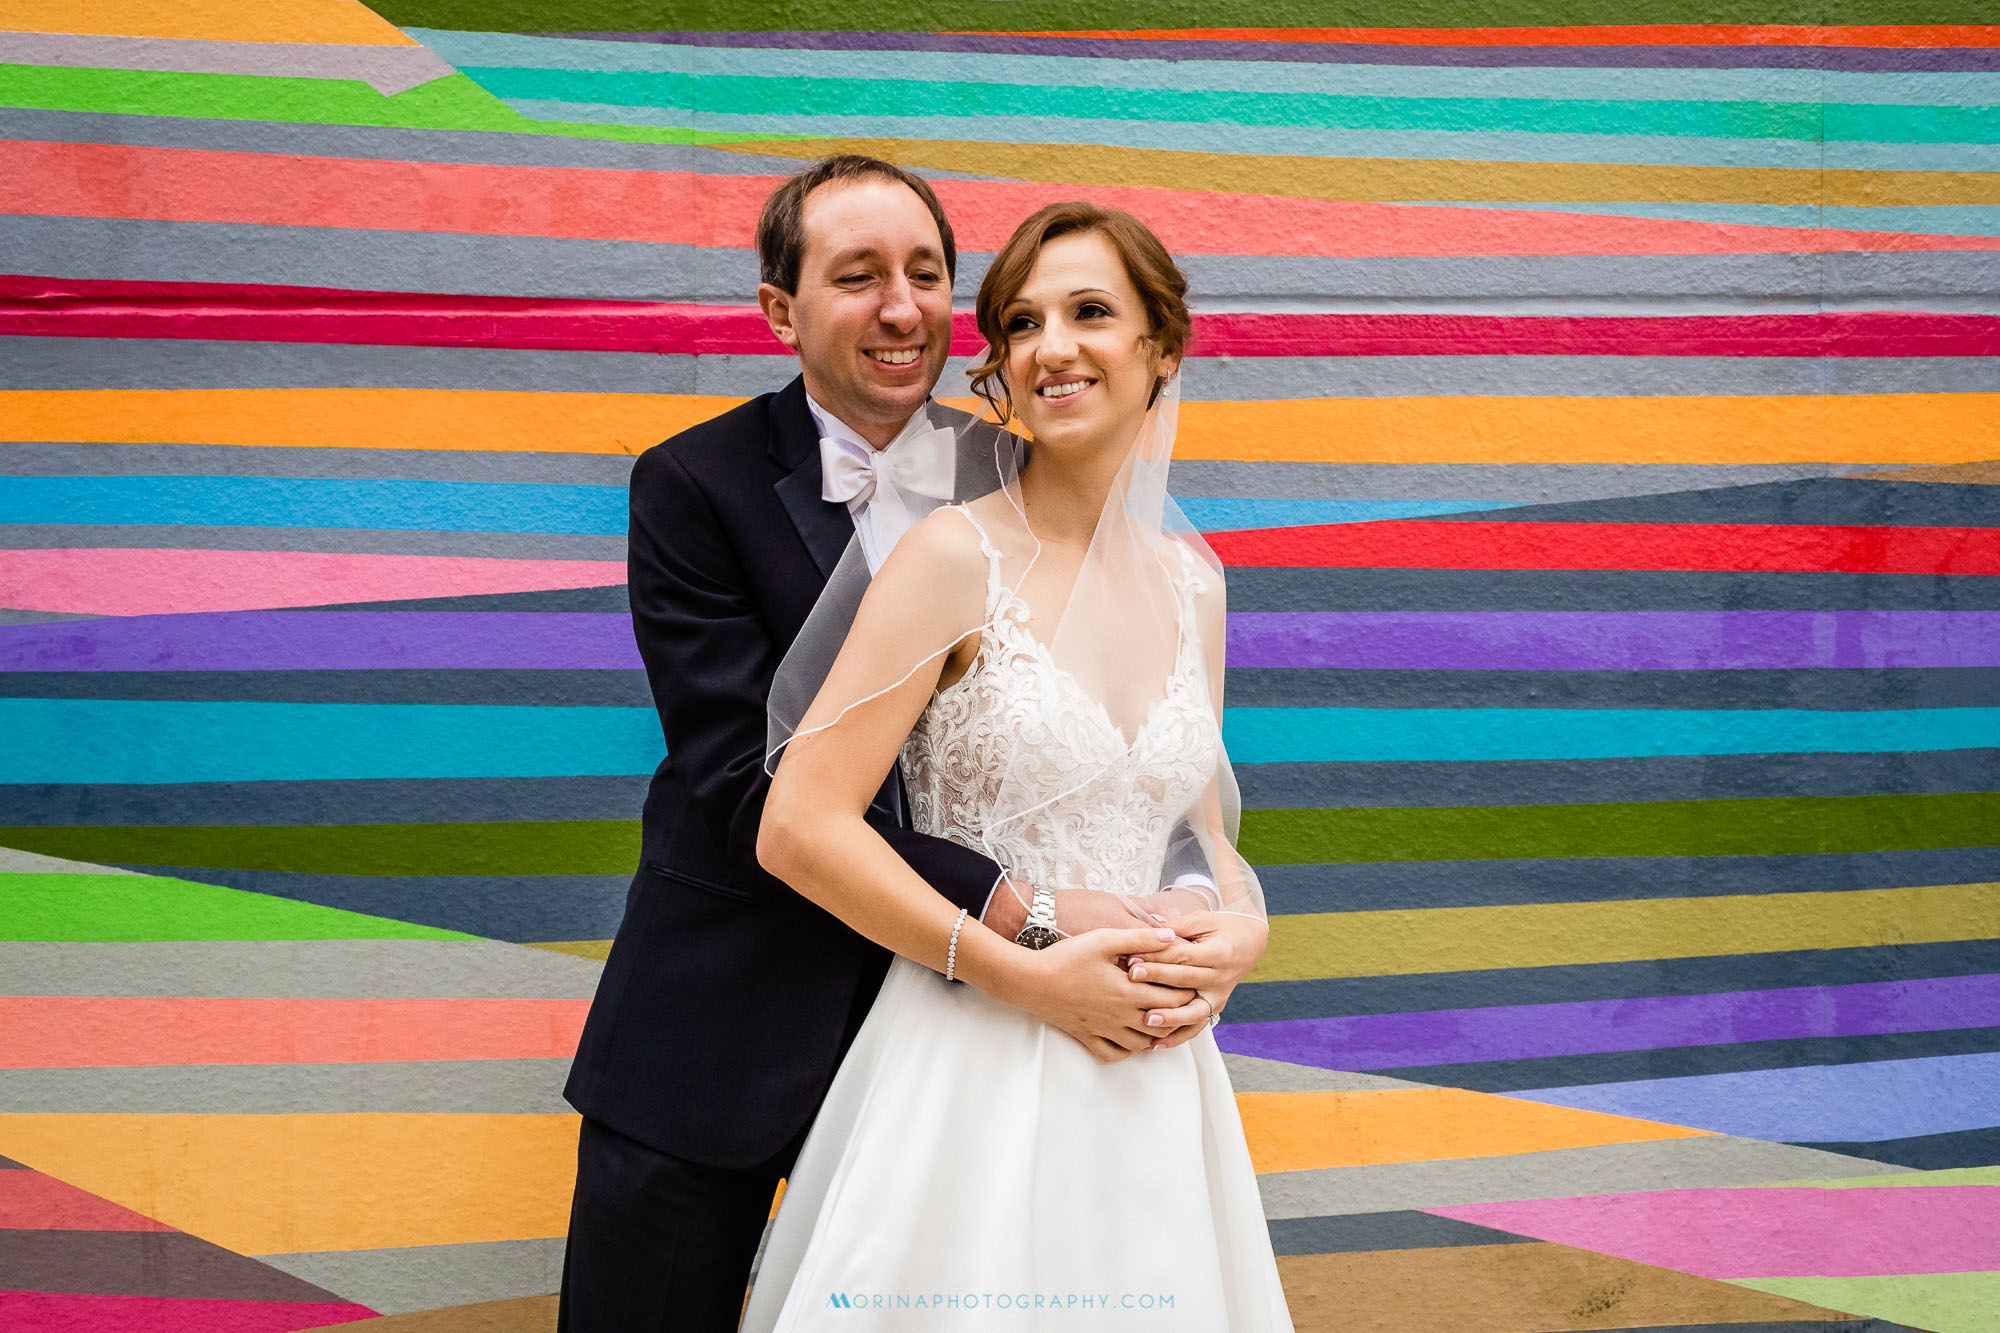 Ilhana & Jonathan Wedding at Vault 634 - Allentown 0036.jpg